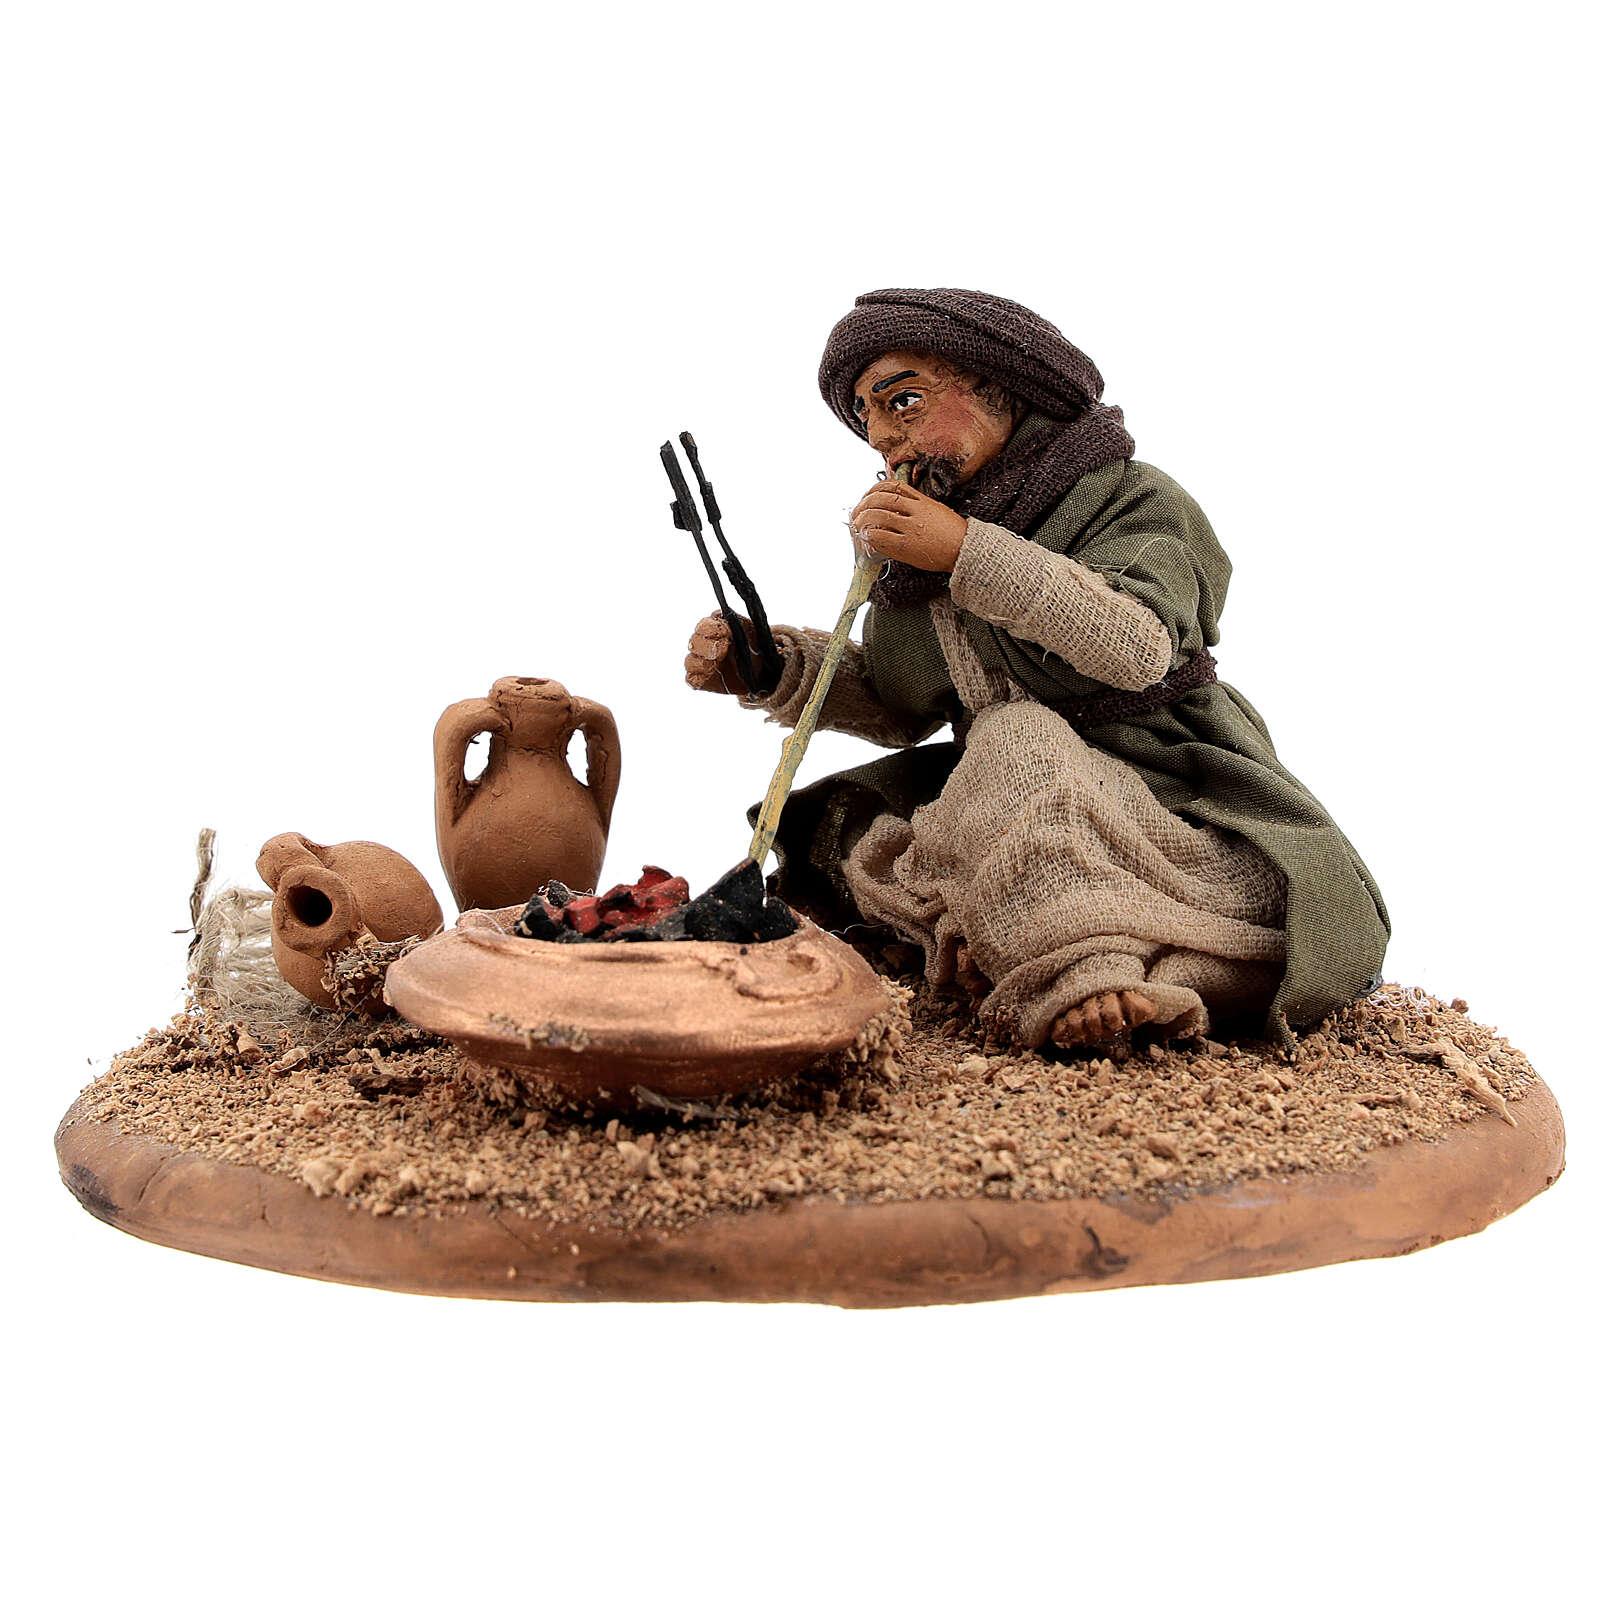 Man with fire 10 cm figurine Neapolitan Nativity Scene 4